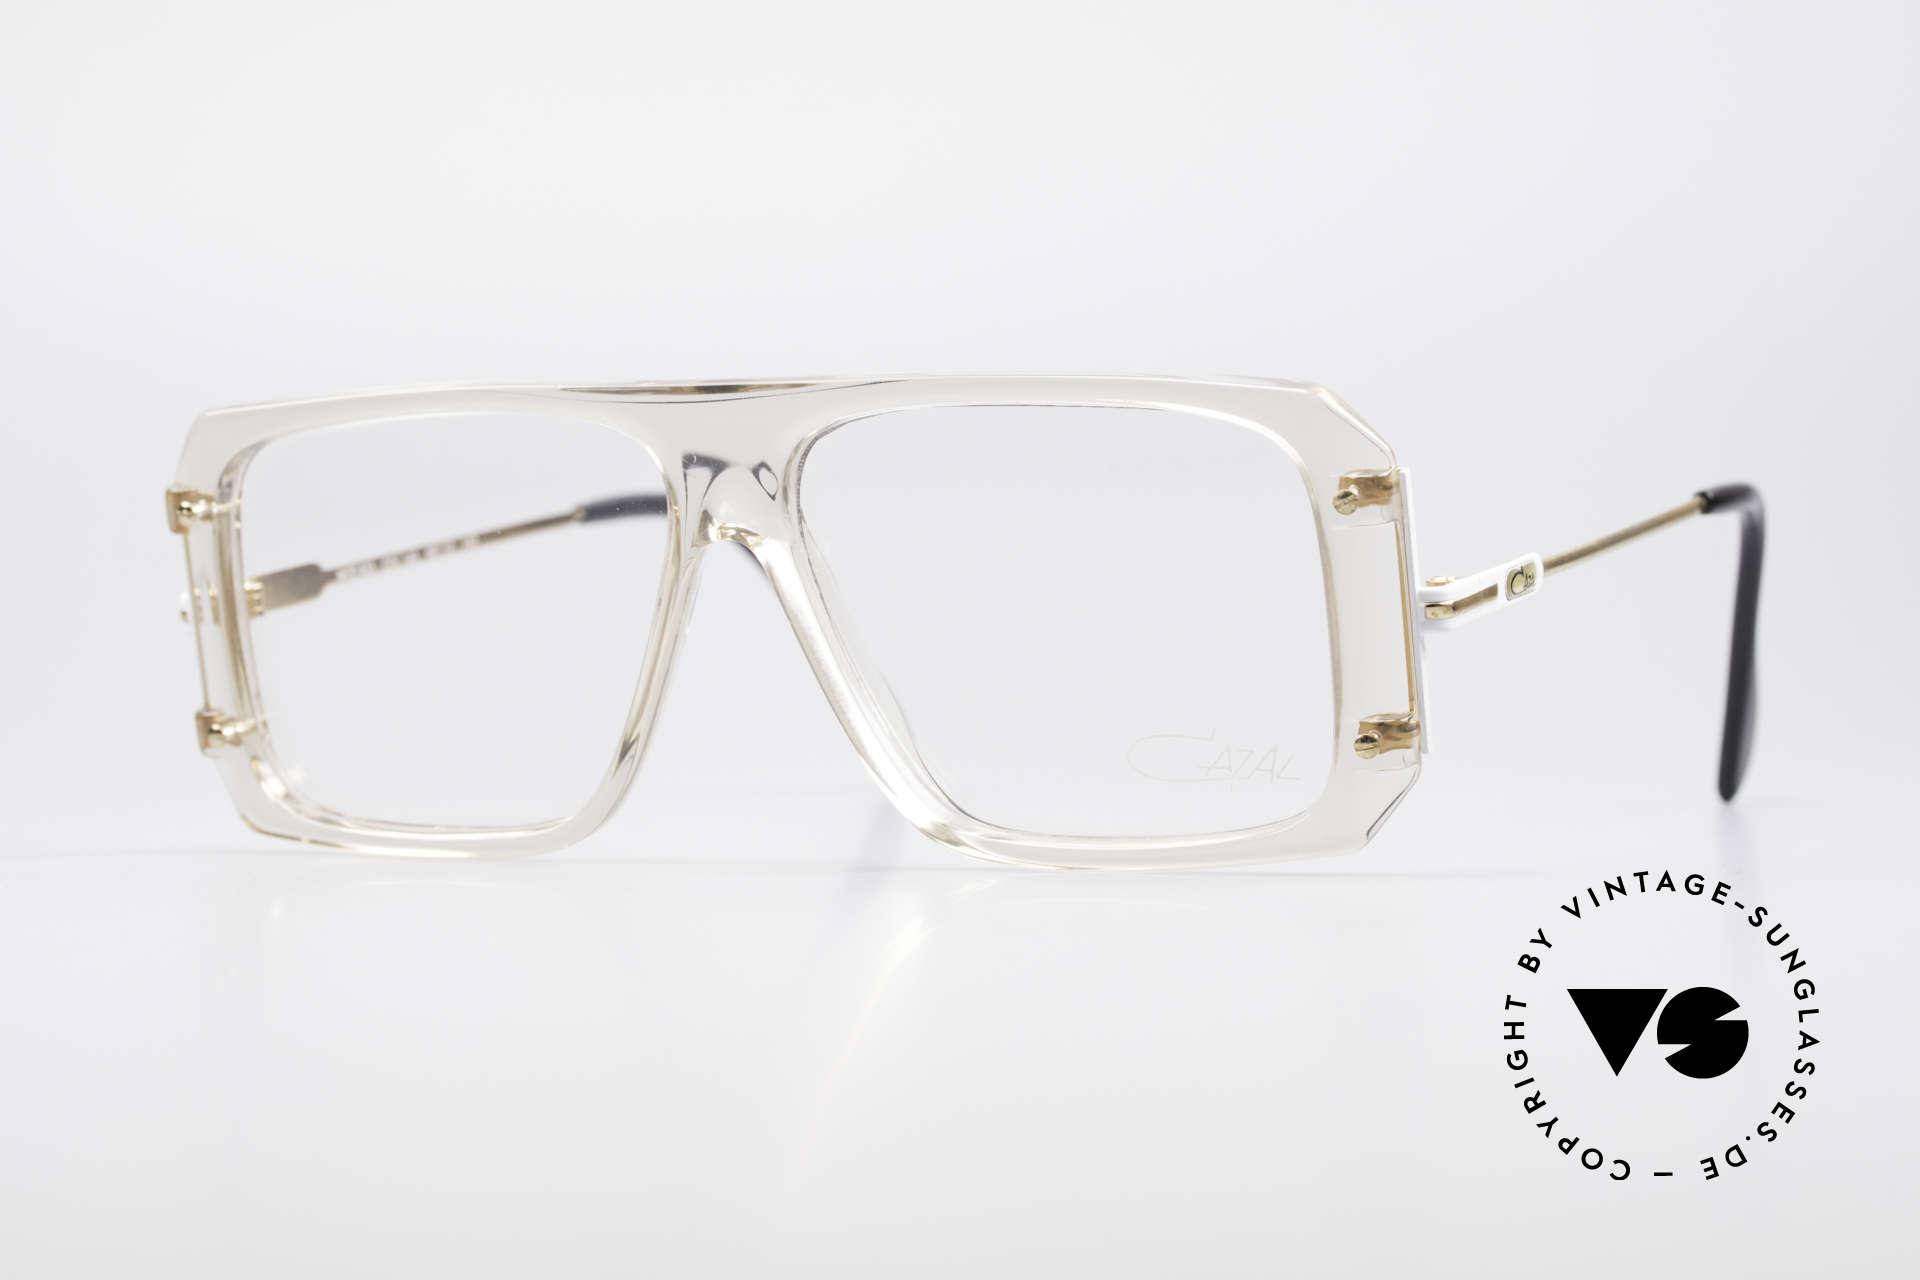 Cazal 633 Vintage Celebrity Eyeglasses, rare vintage CAZAL eyeglasses from 1988; size 58/12, Made for Men